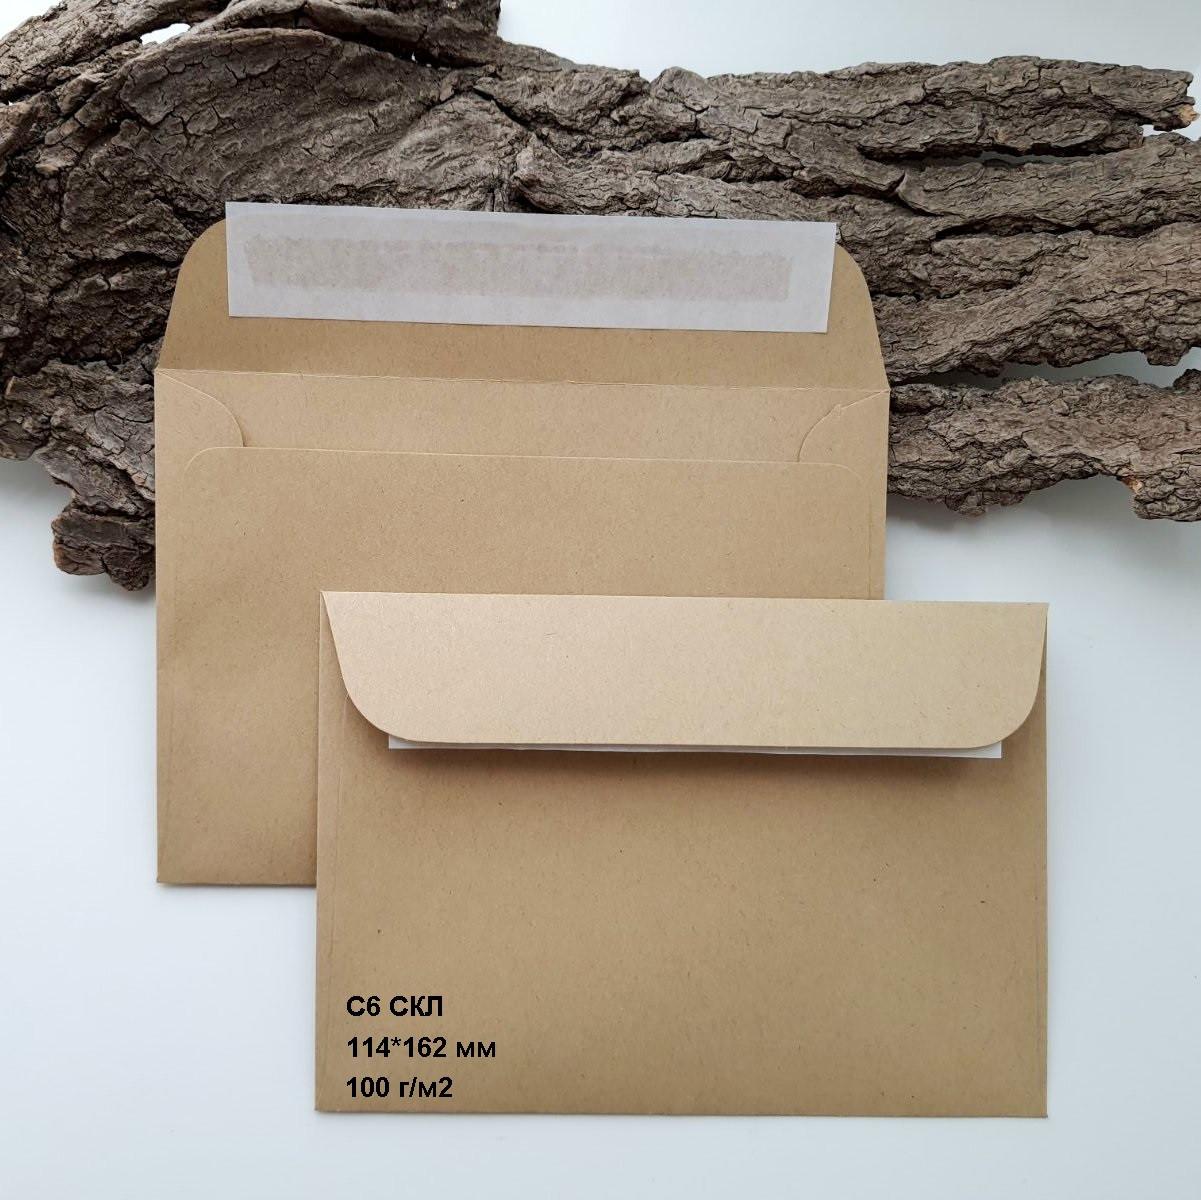 Почтовый крафт конверт С6, 114 х 162 мм, від 1 шт отрывная лента, 100 гр/кв.м